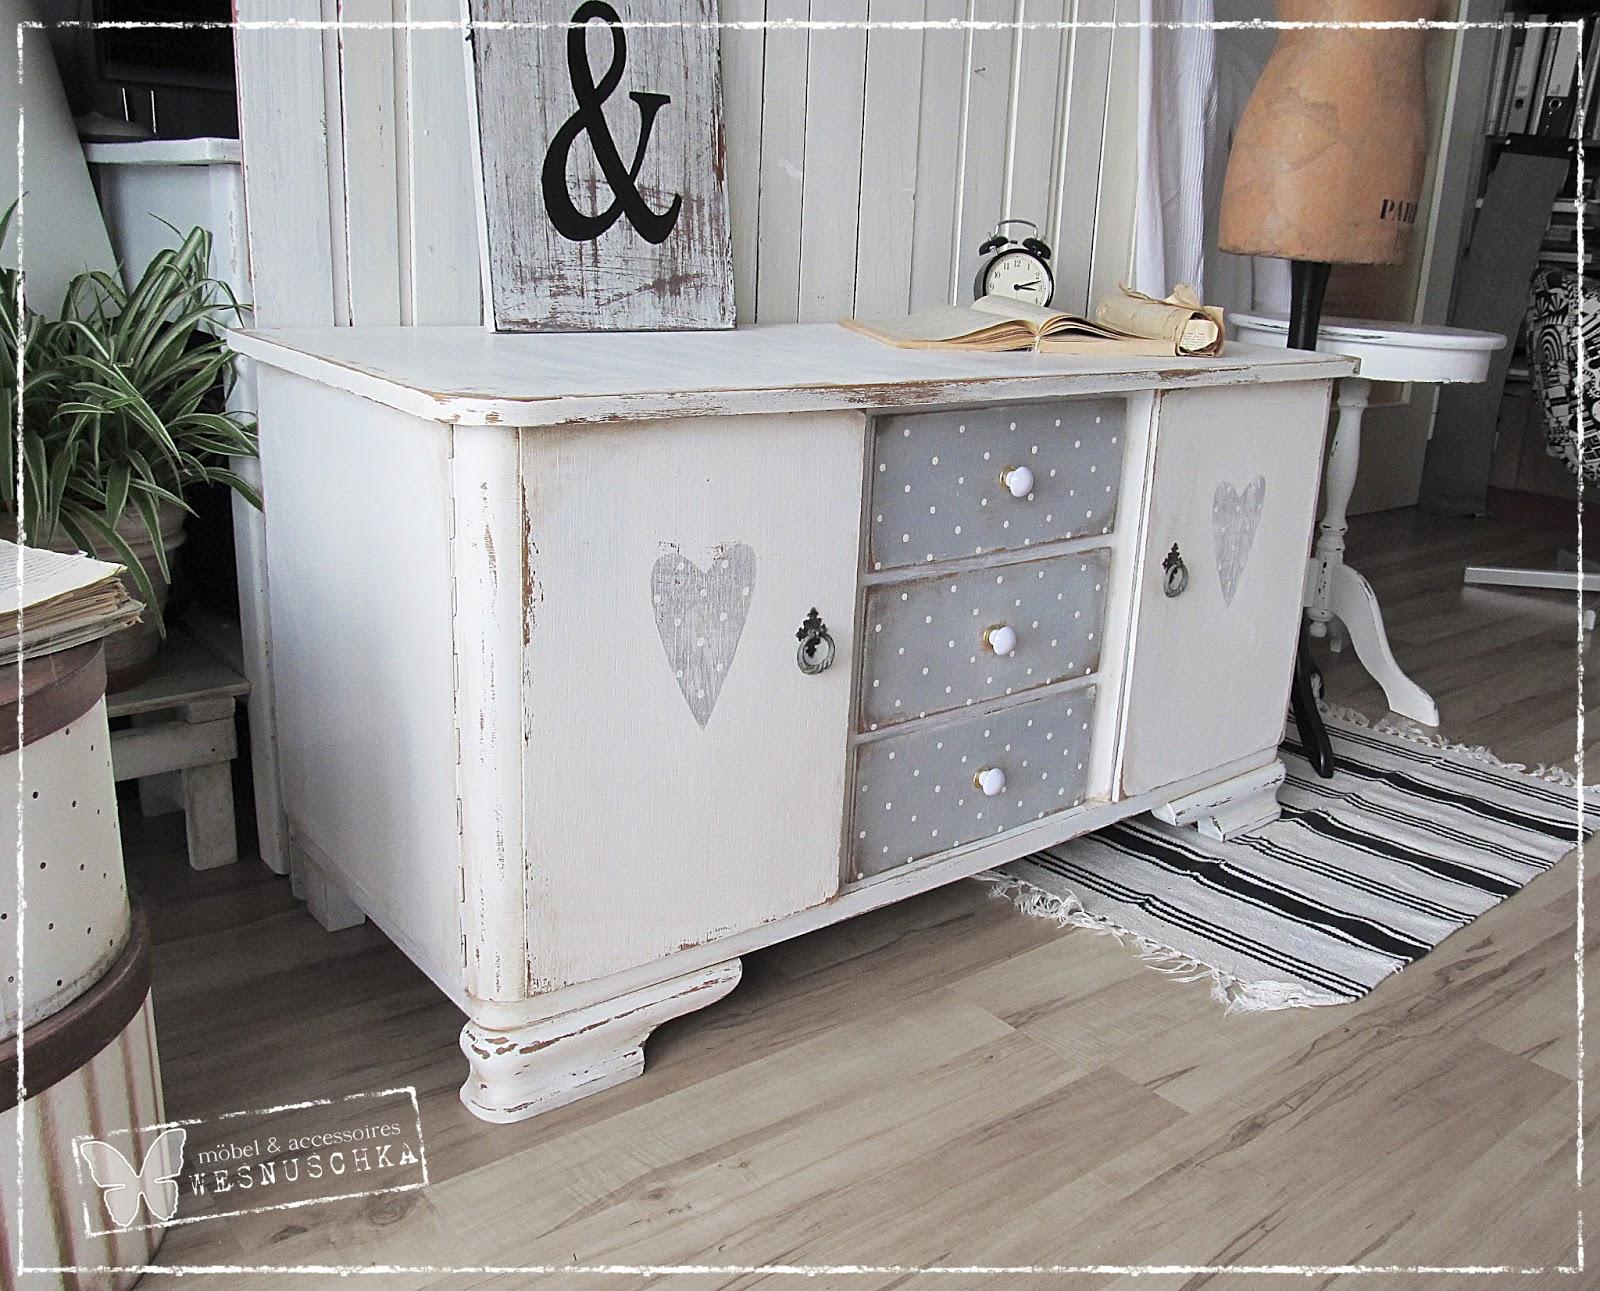 kchen kommode amazing kommode in lack wei matt with kchen. Black Bedroom Furniture Sets. Home Design Ideas